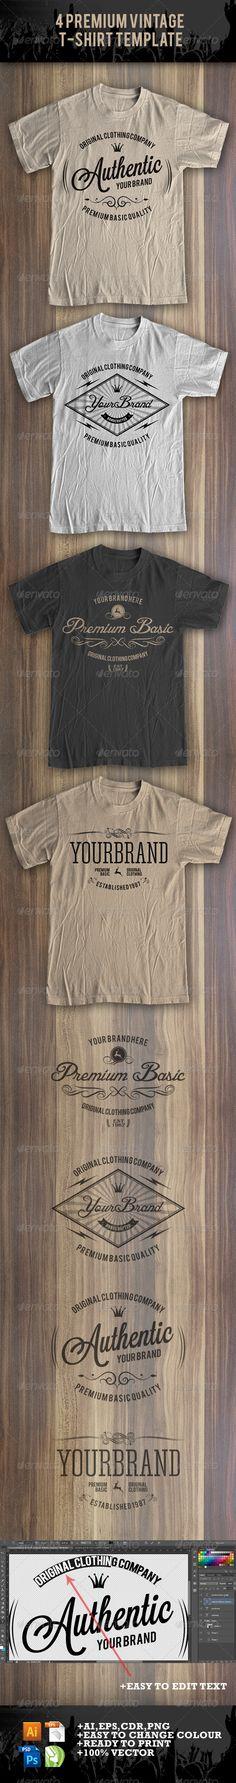 4 Premium T-Shirt Template Vector EPS, AI. Download here: http://graphicriver.net/item/4-premium-tshirt-template/8369029?ref=ksioks